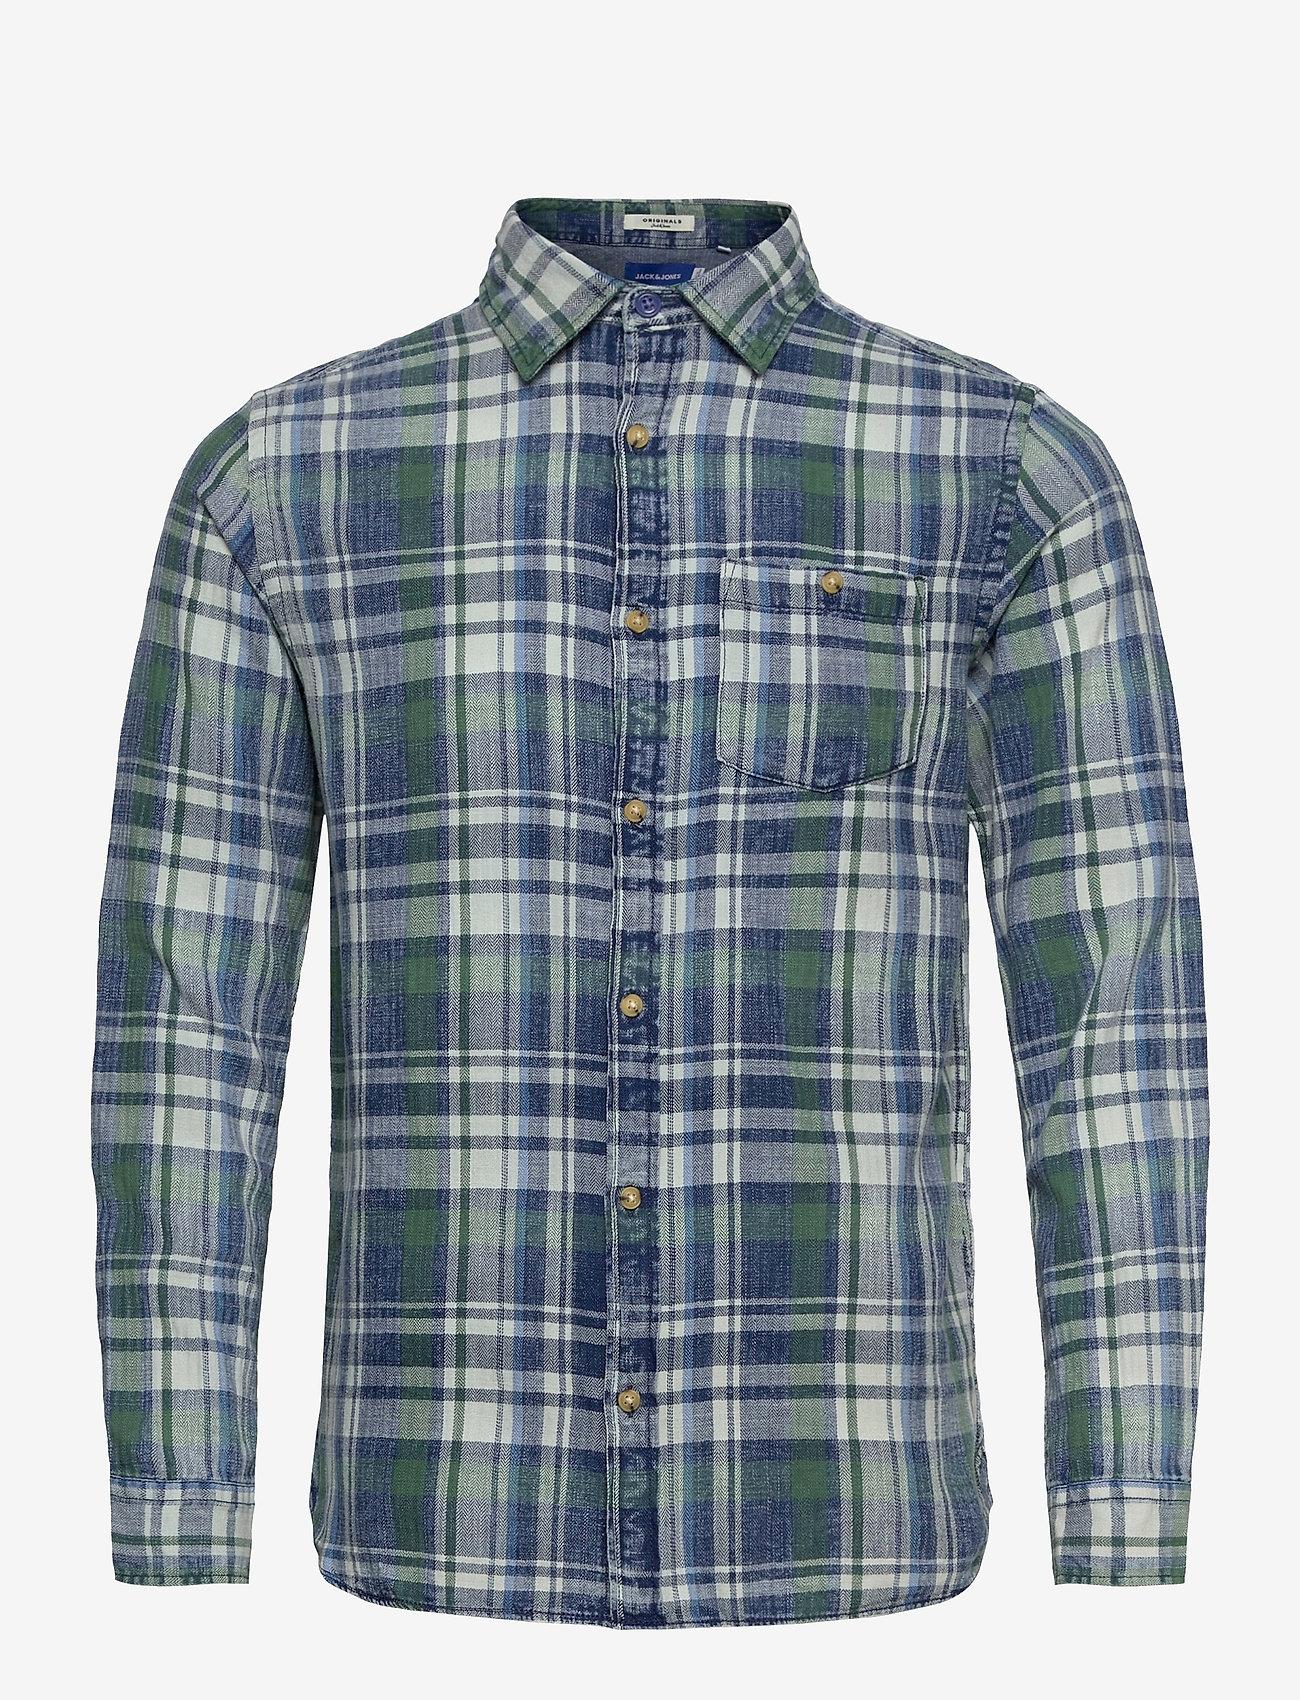 Jack & Jones - JORHANS SHIRT LS - rutiga skjortor - trekking green - 0